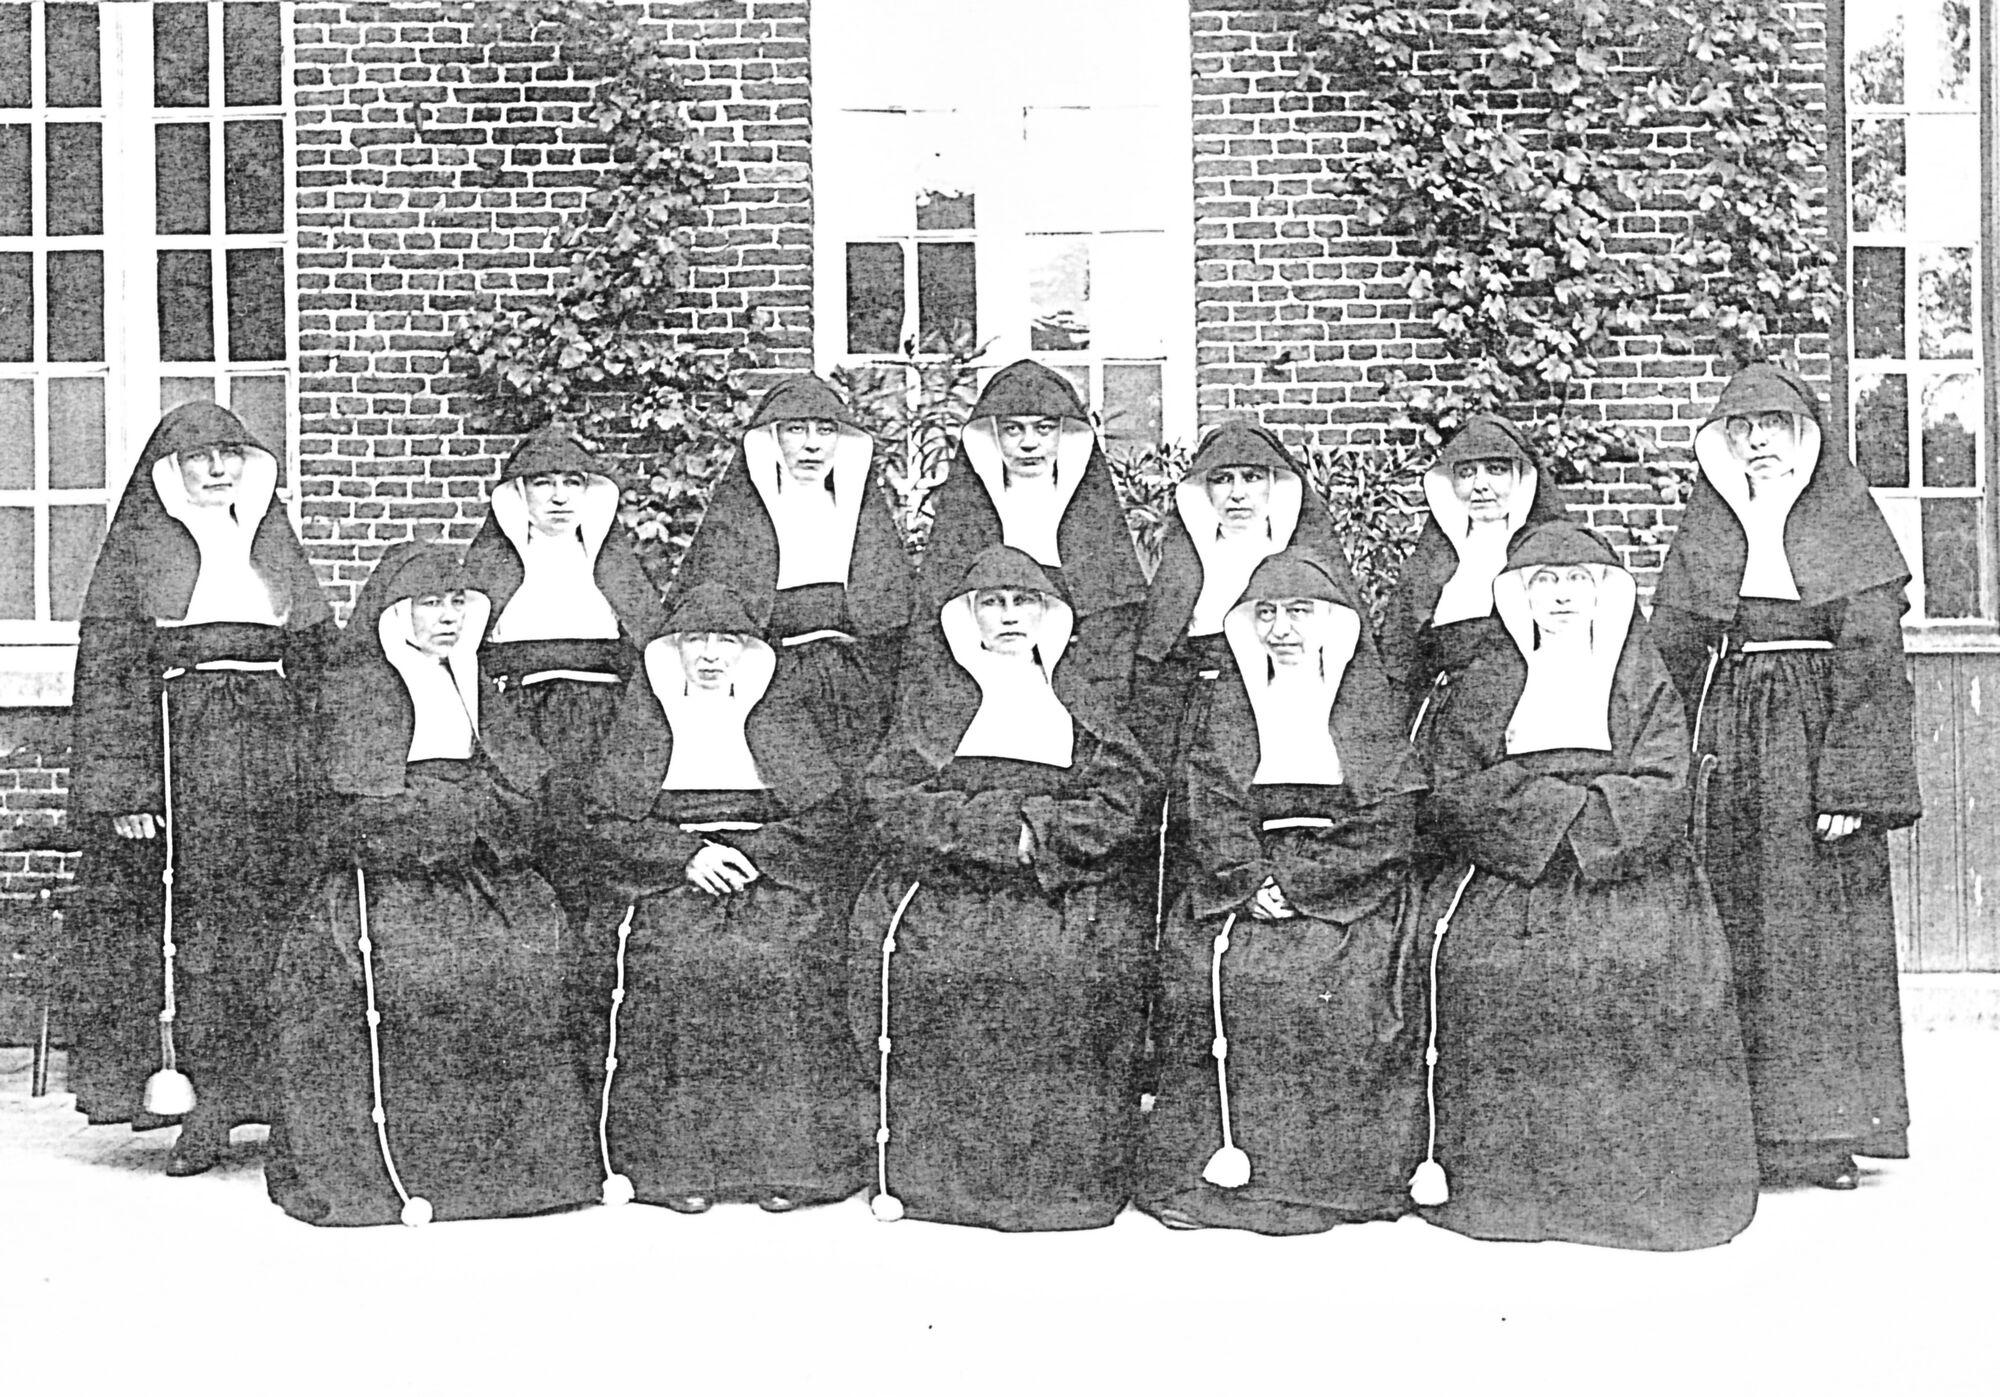 Klooster Deftinge - kloosterzusters